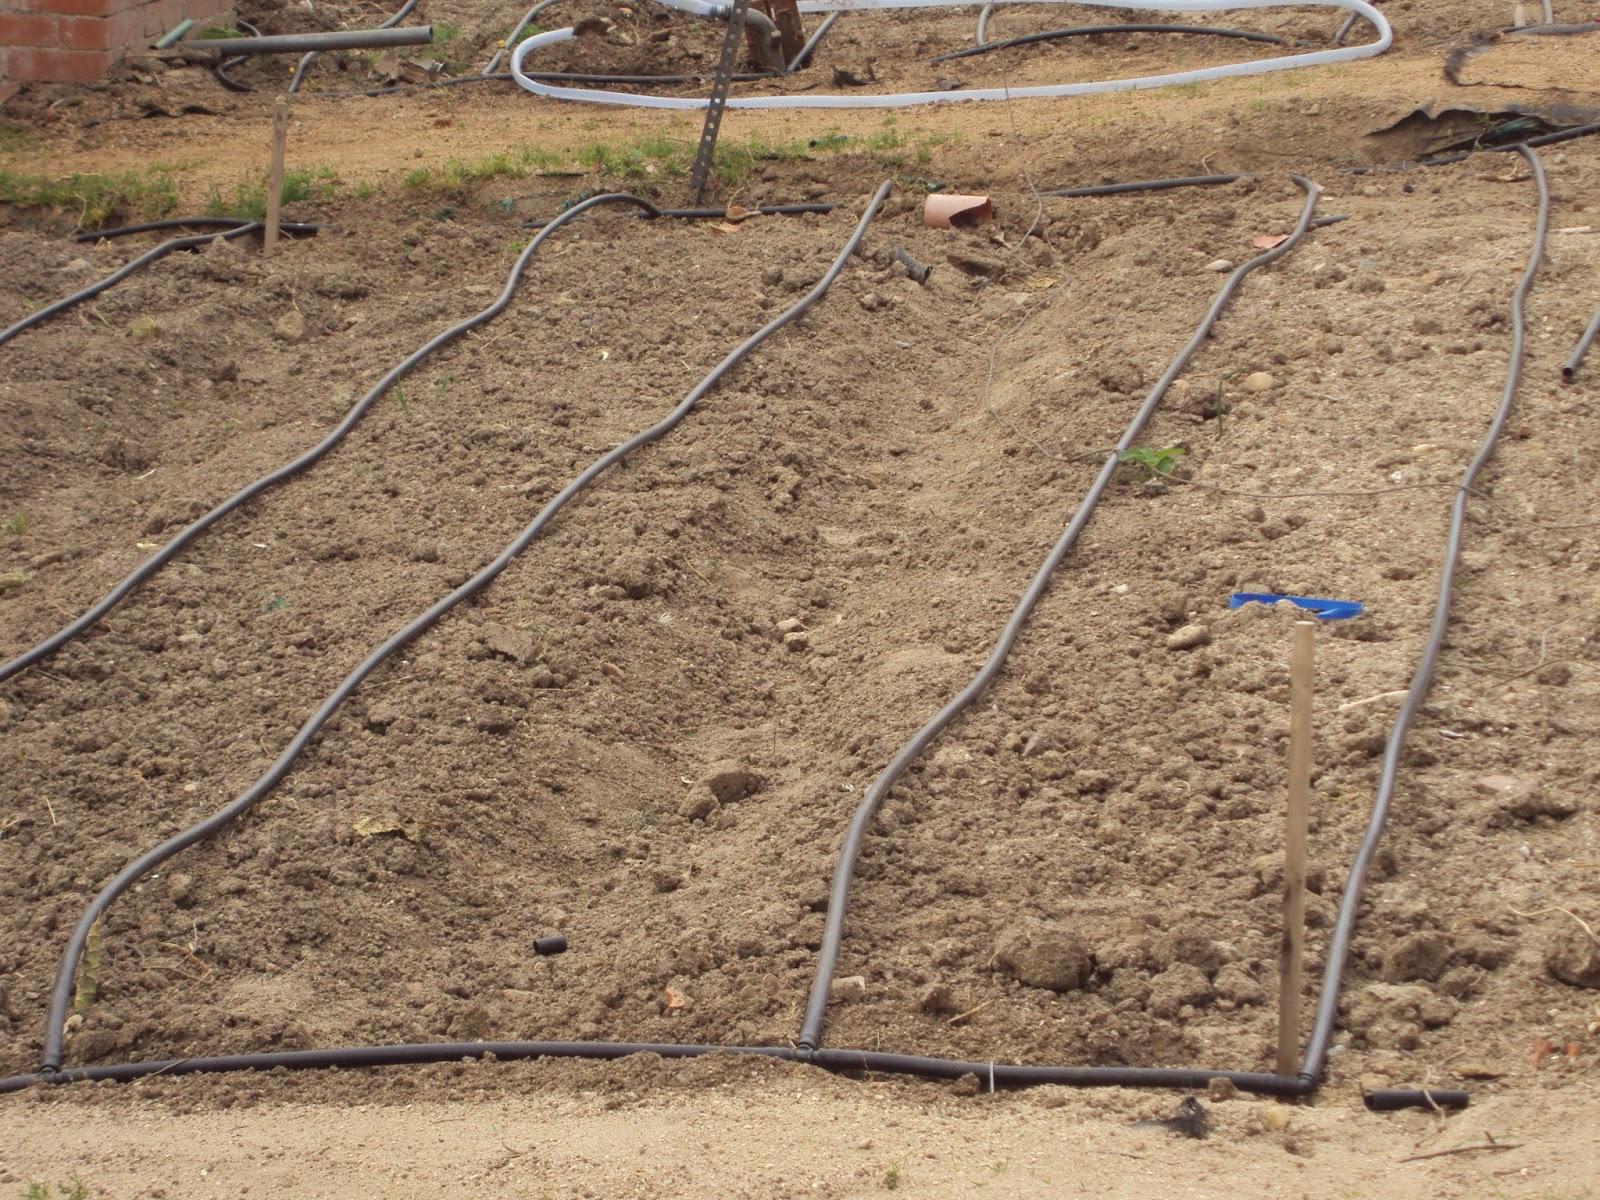 En torno al huerto nuevo montaje del riego por goteo - Sistema riego goteo ...